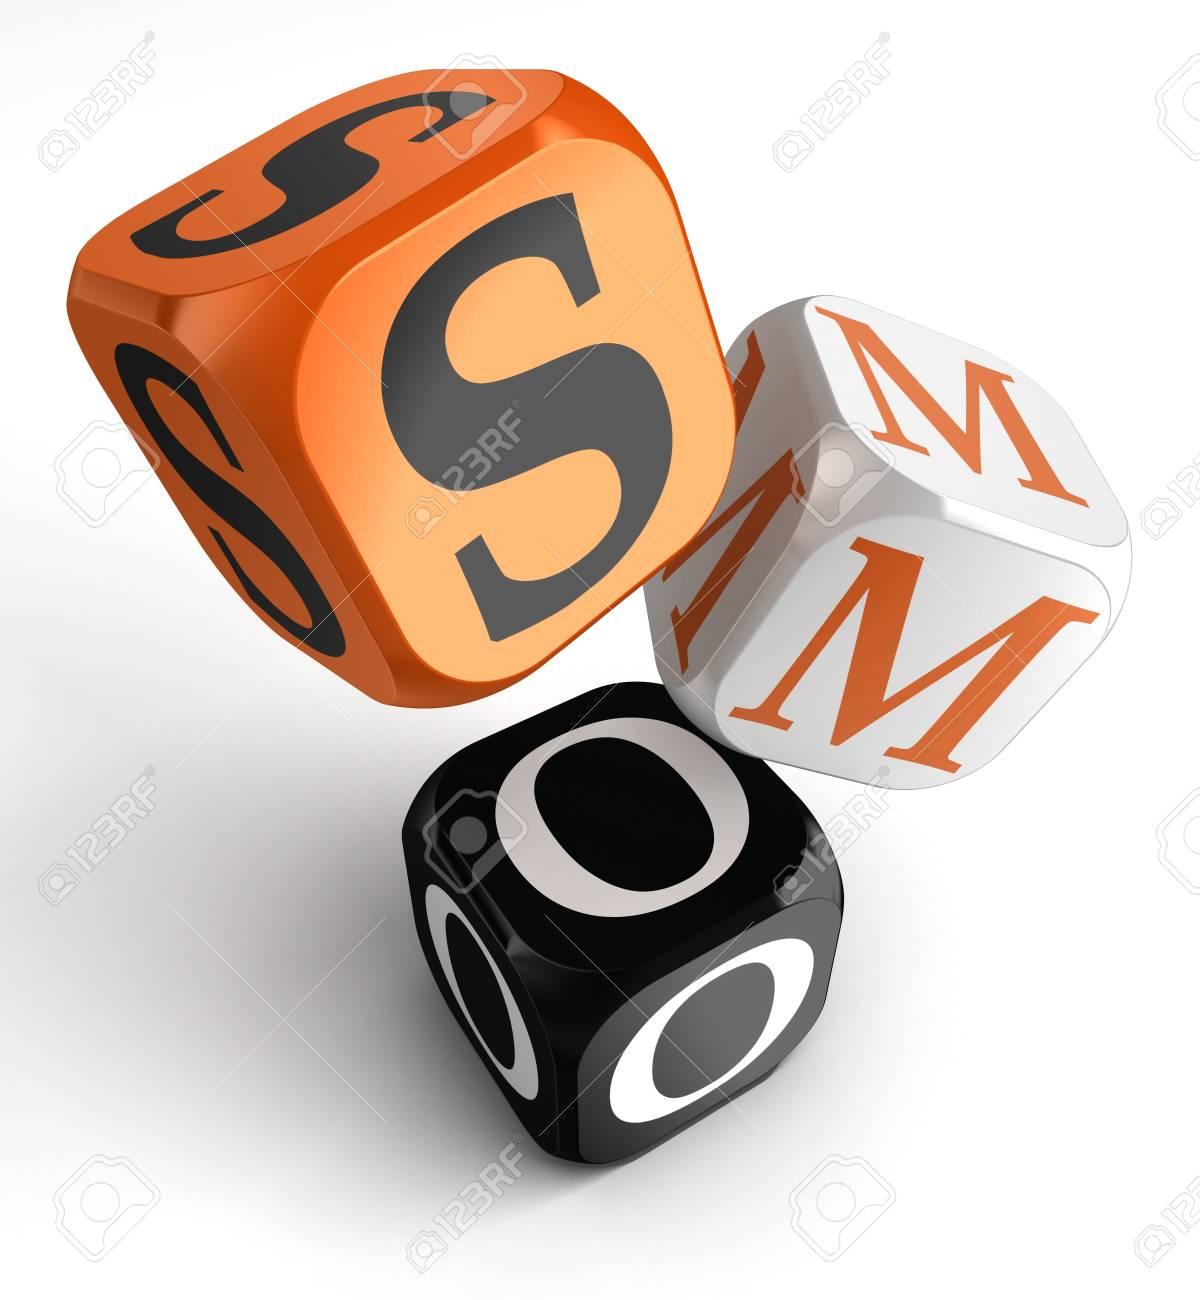 social media optimization orange black dice blocks on white background  clipping path included Stock Photo - 19022420